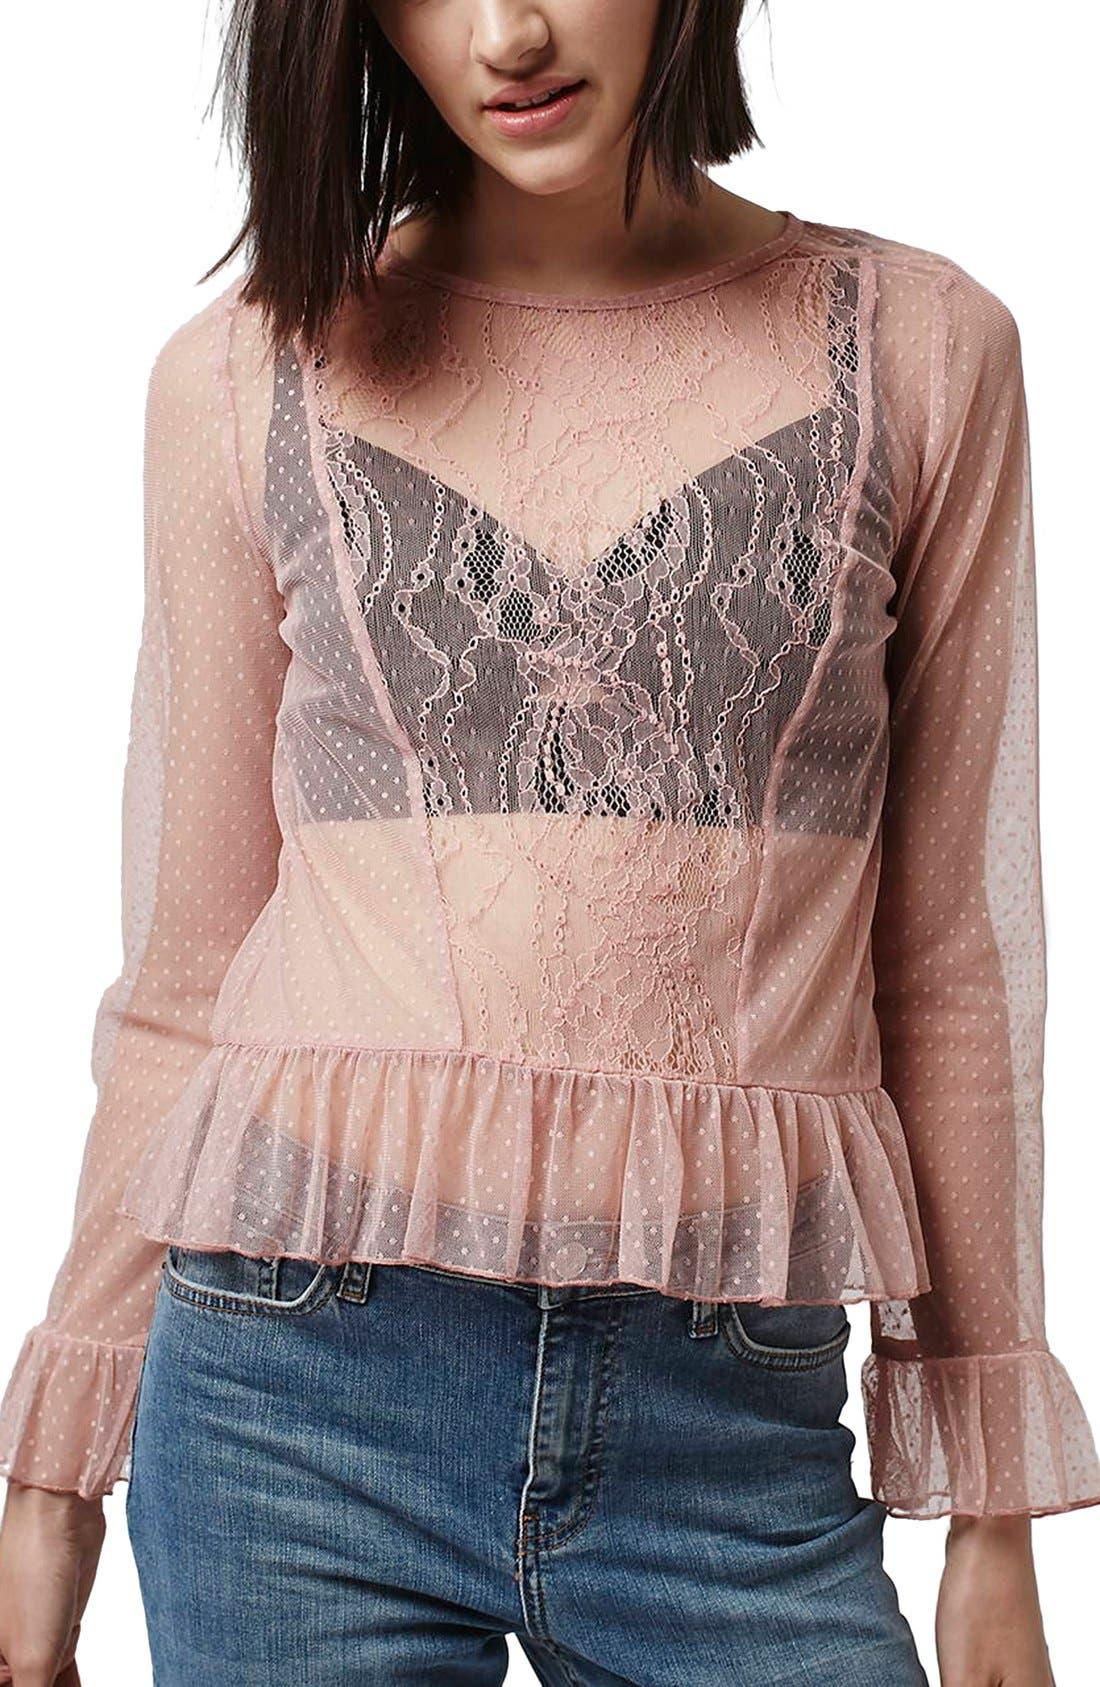 Alternate Image 1 Selected - Topshop Sheer Lace Ruffle Hem Top